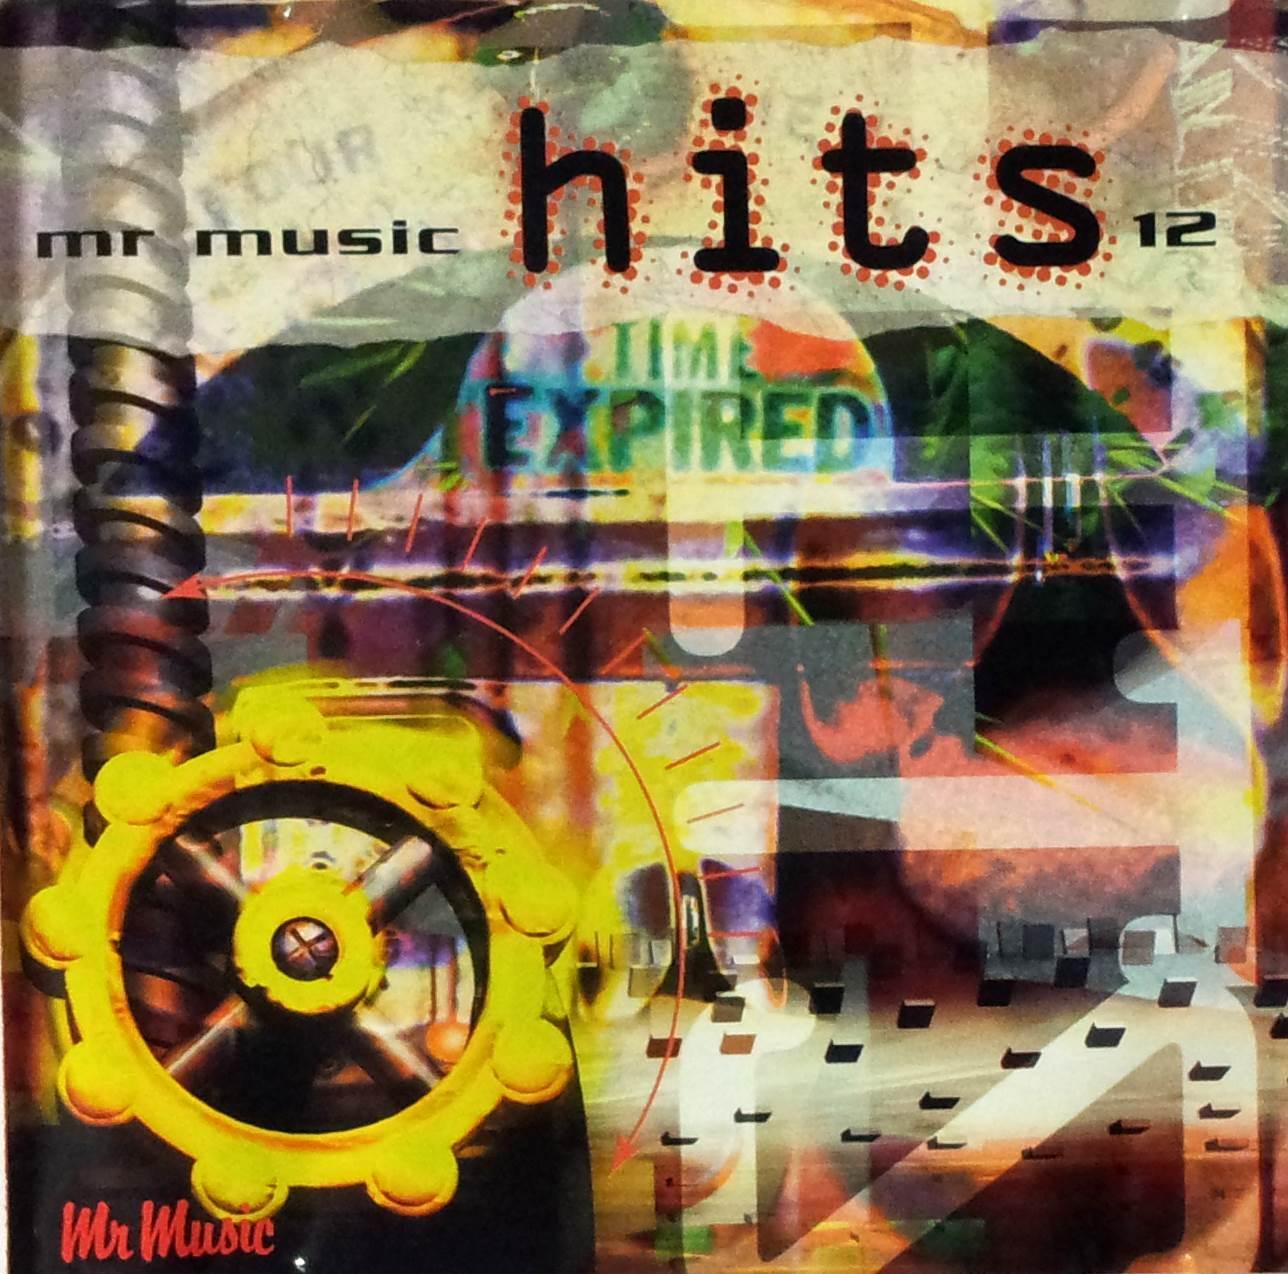 Mr Music Hits 12/96